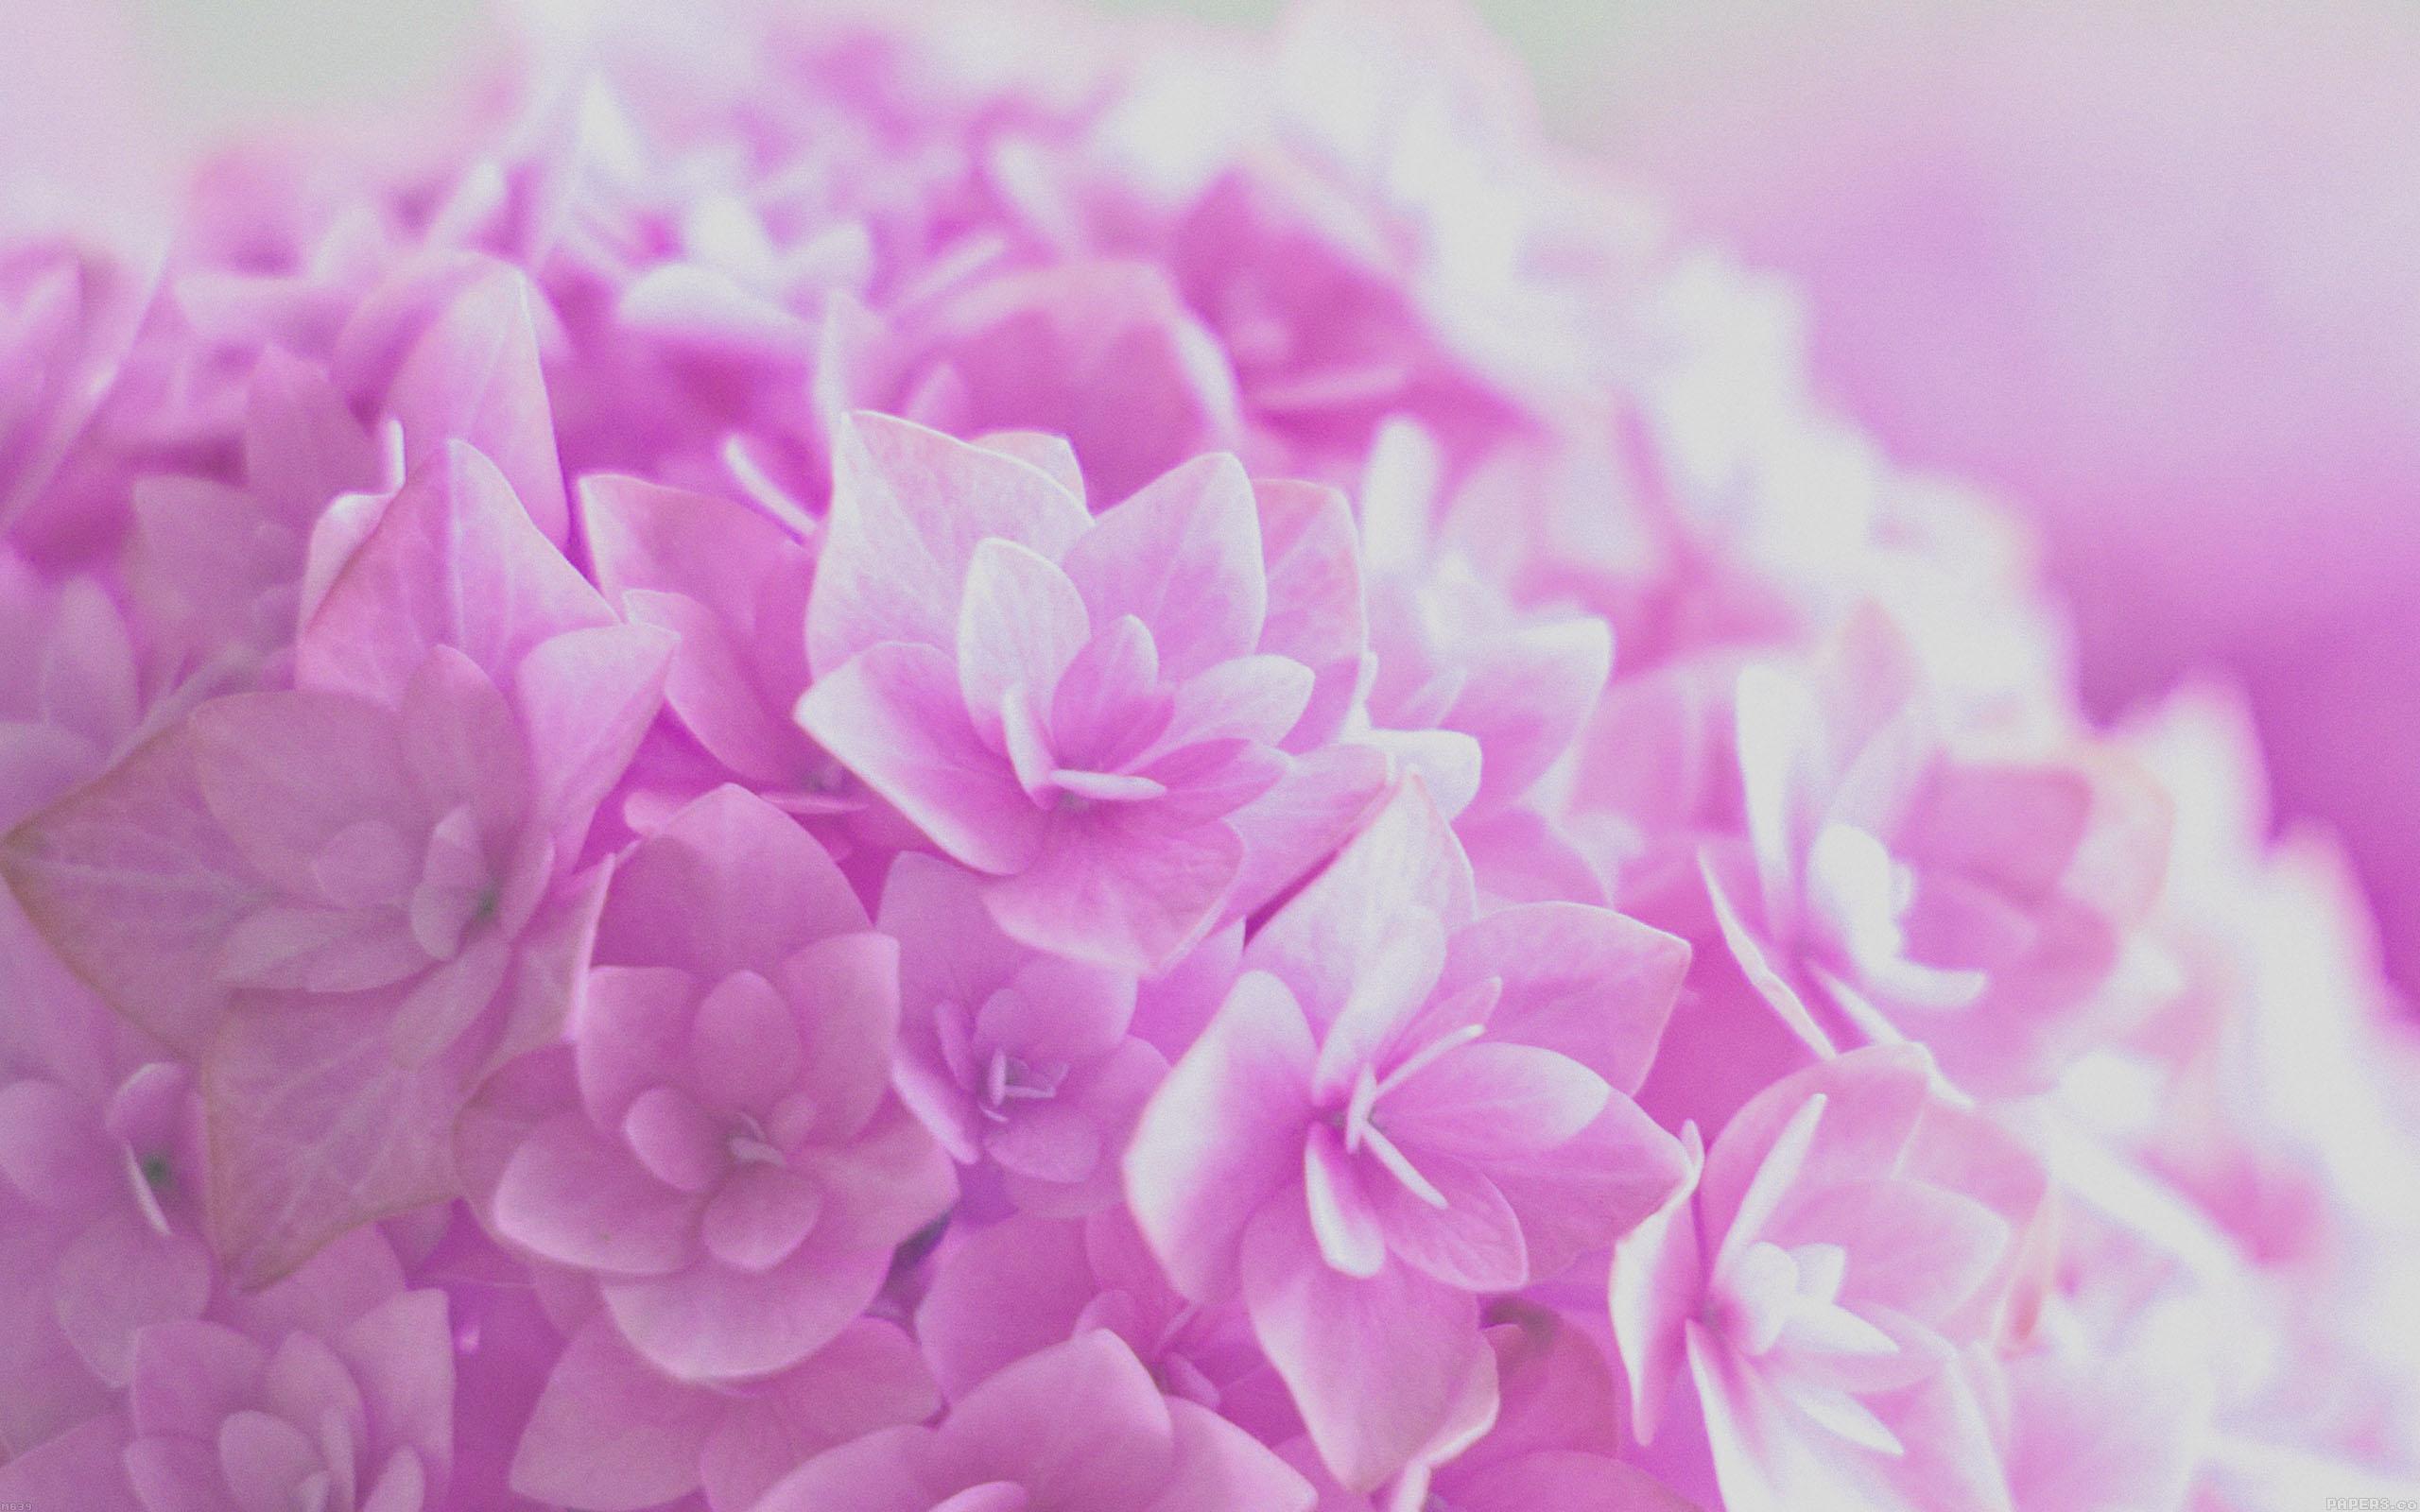 Ariana Grande Wallpaper Iphone 6 3840 X 2160